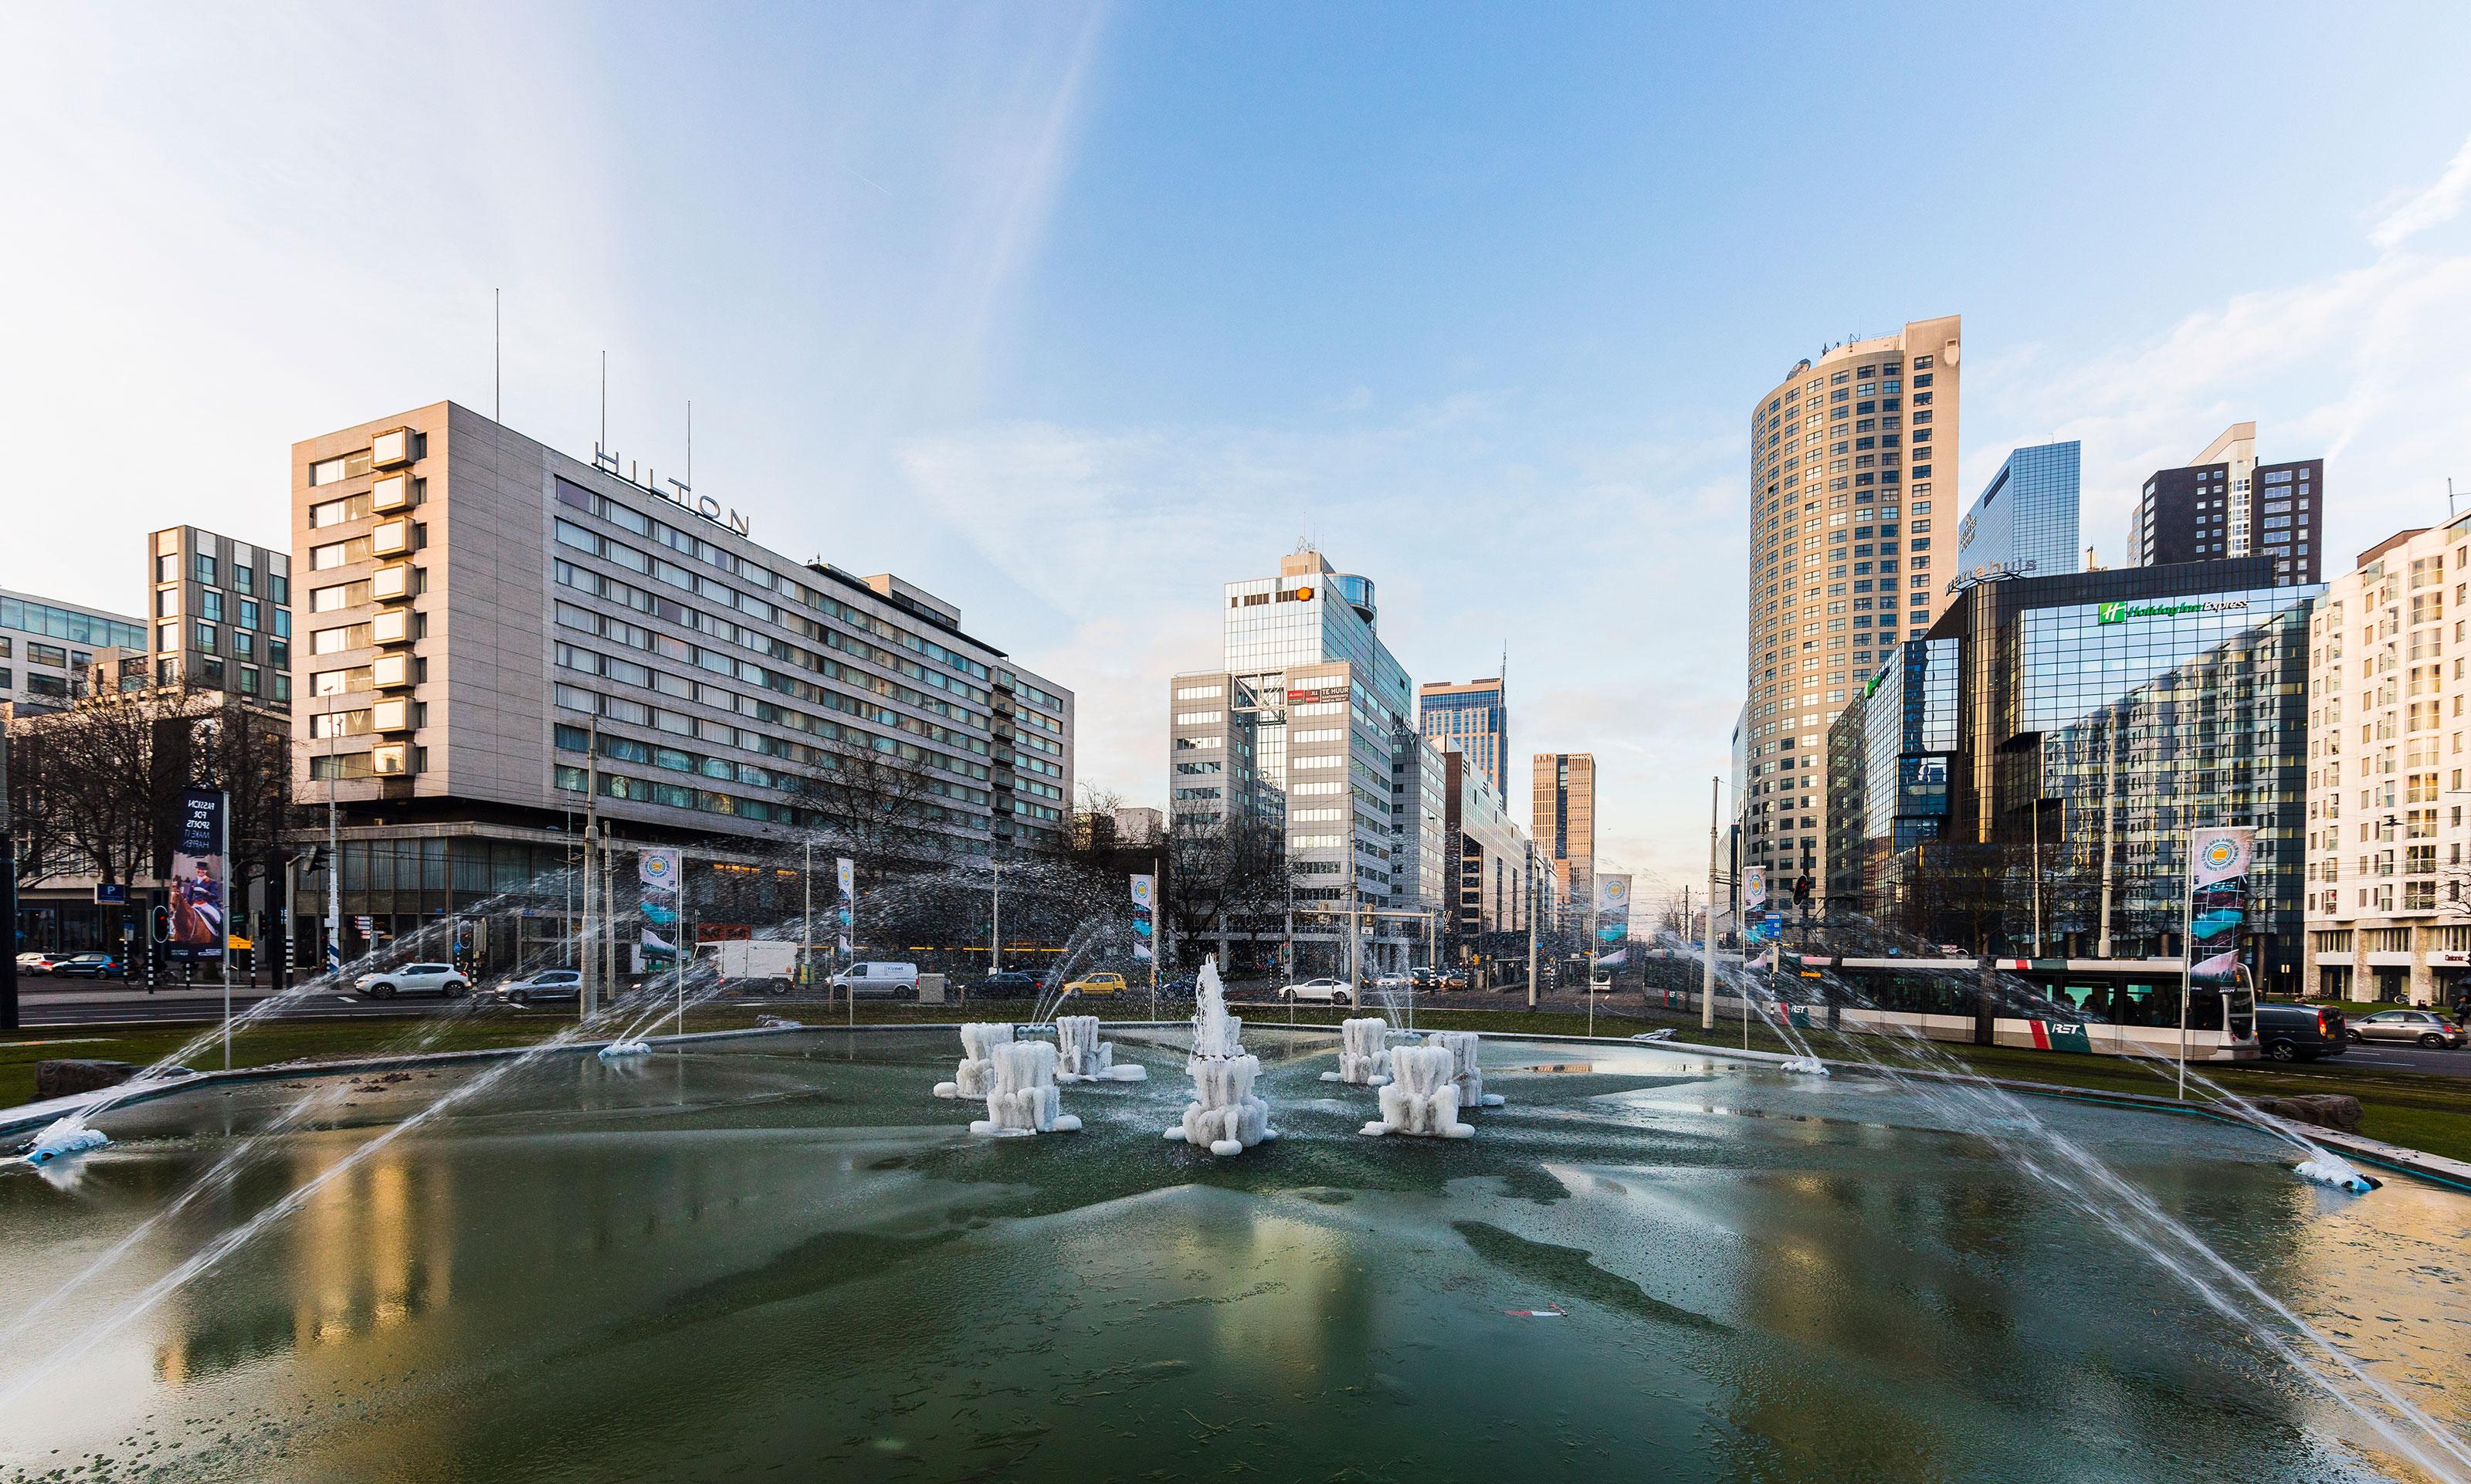 Rotterdam Vvv Kantoor : Binnen rotterdam rotterdam tourist information